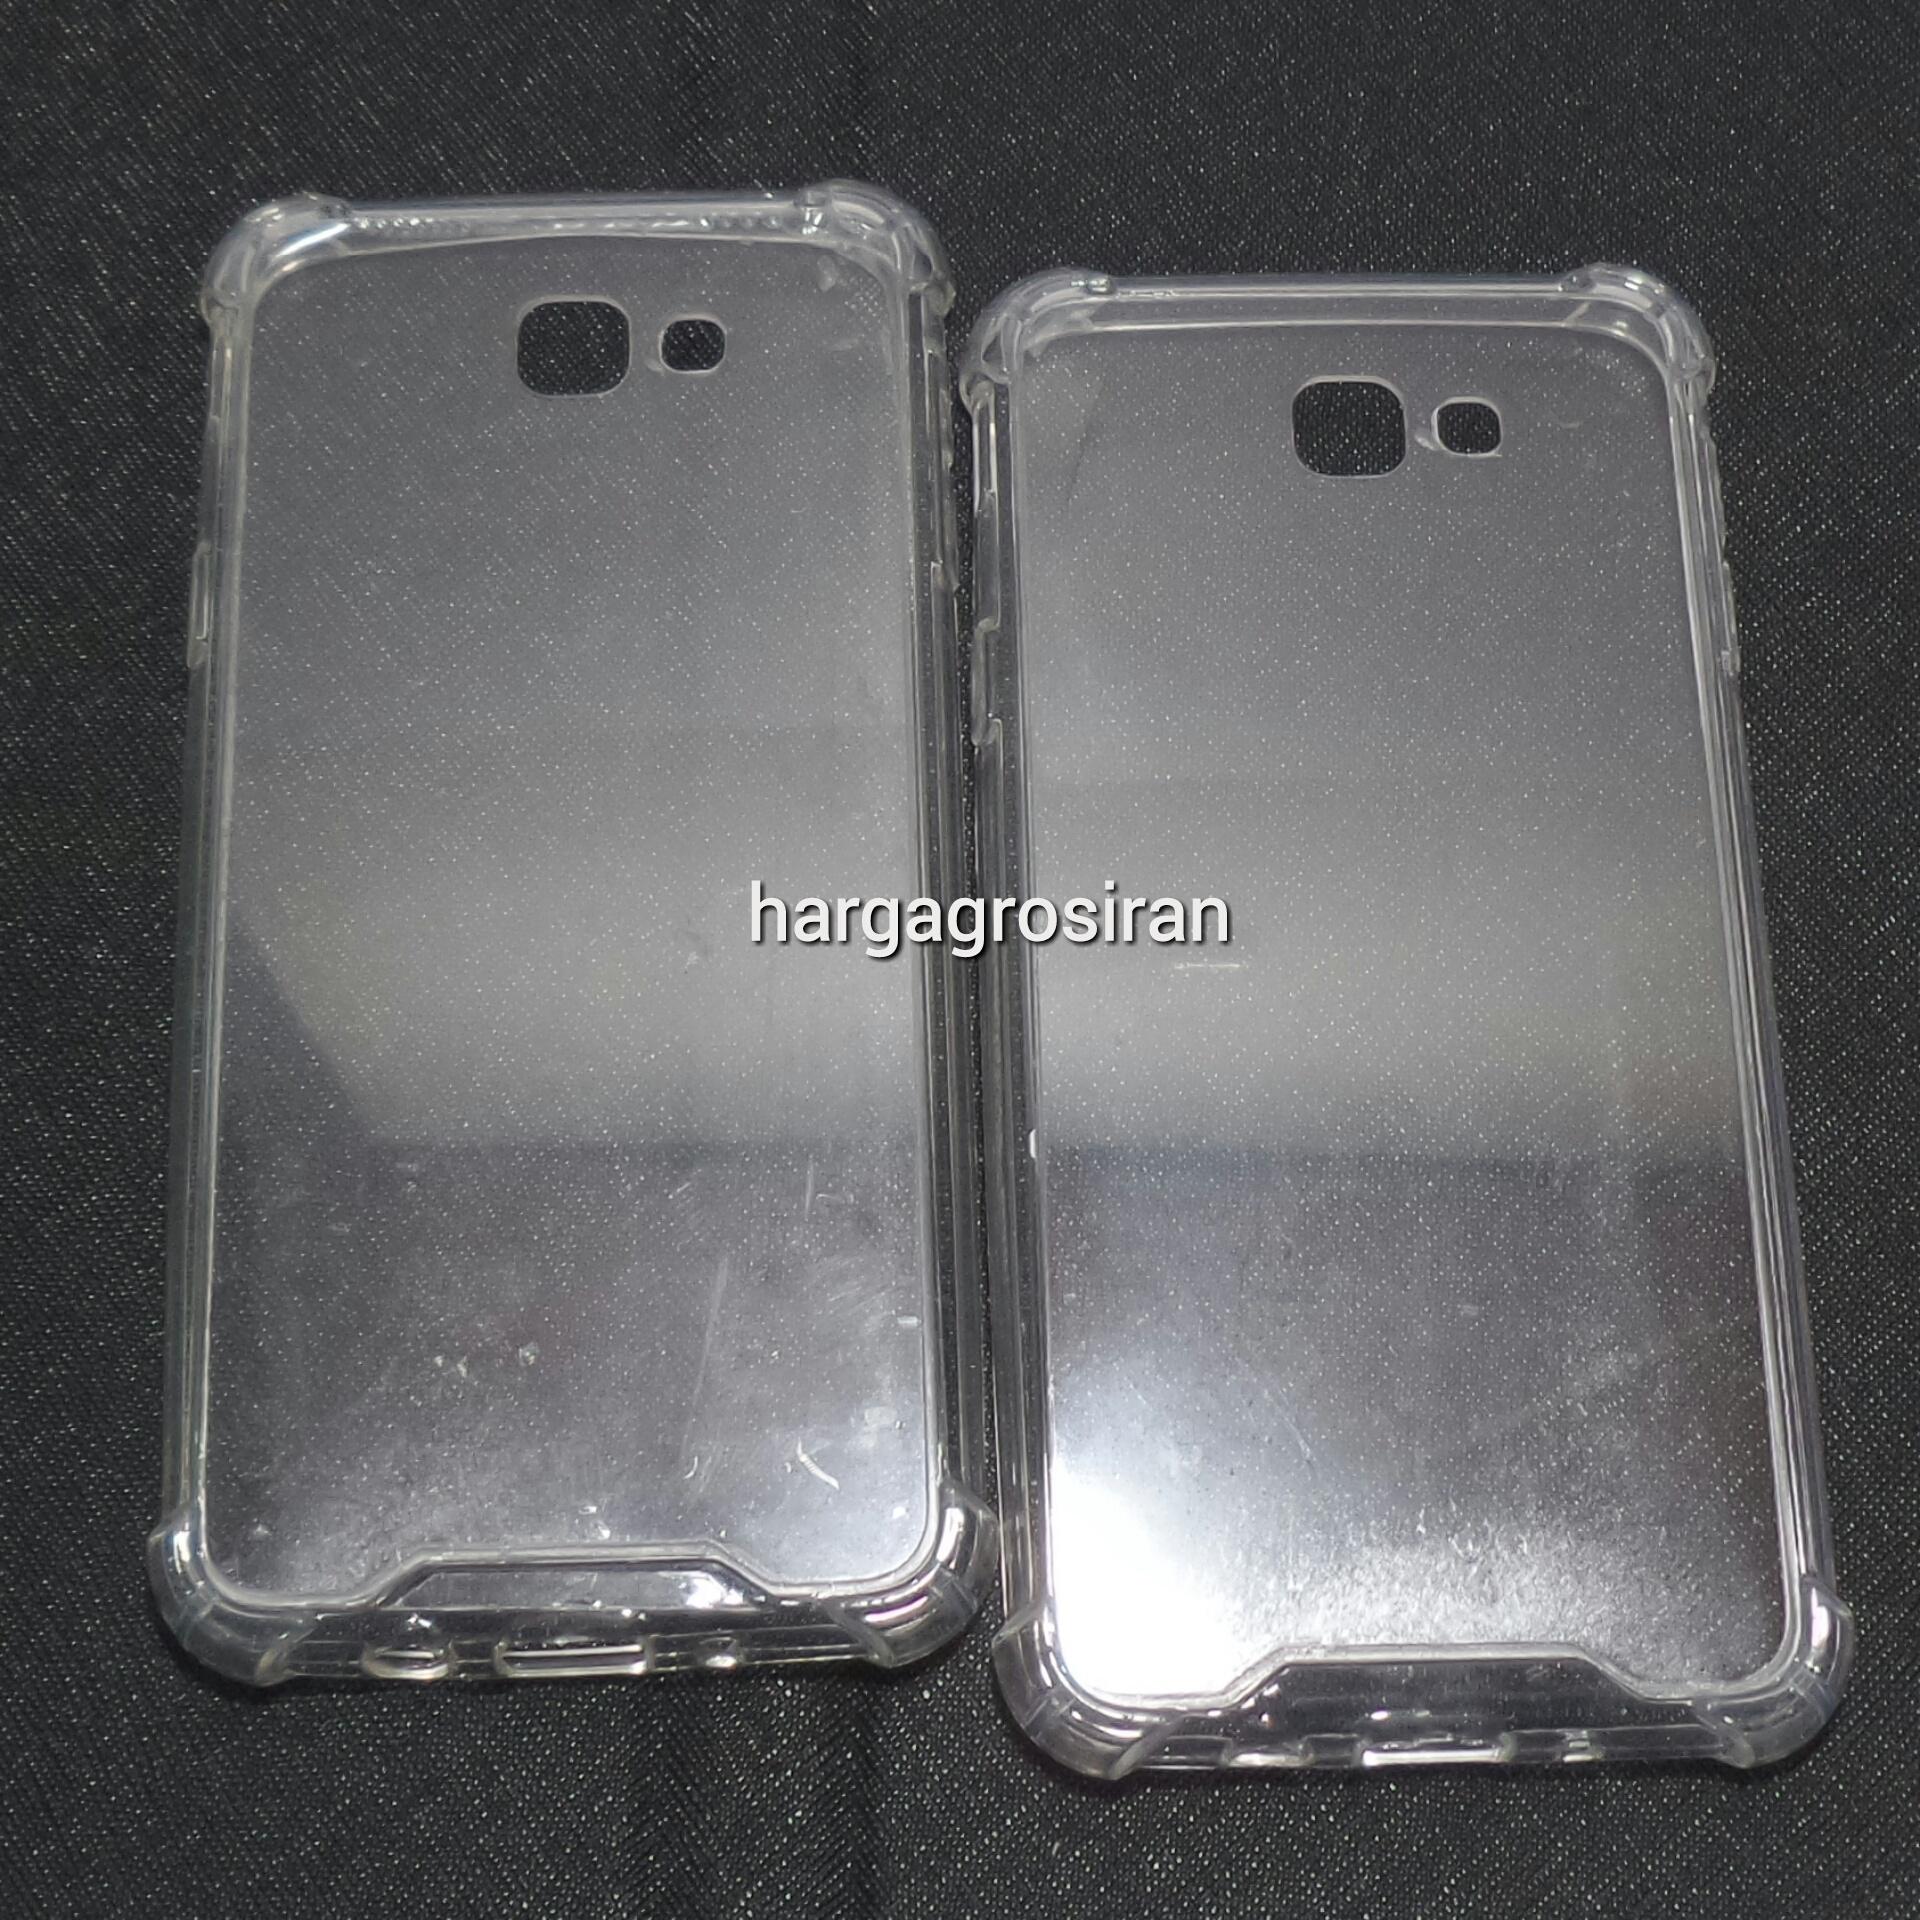 Case Anticrack Samsung J7 Prime Bening Daftar Harga Terbaru Dan Peonia Transparent Acrylic Hybrid On7 Tg Jual Anti Crack Fuze Galaxy J5 Shockproff Shock Distributor